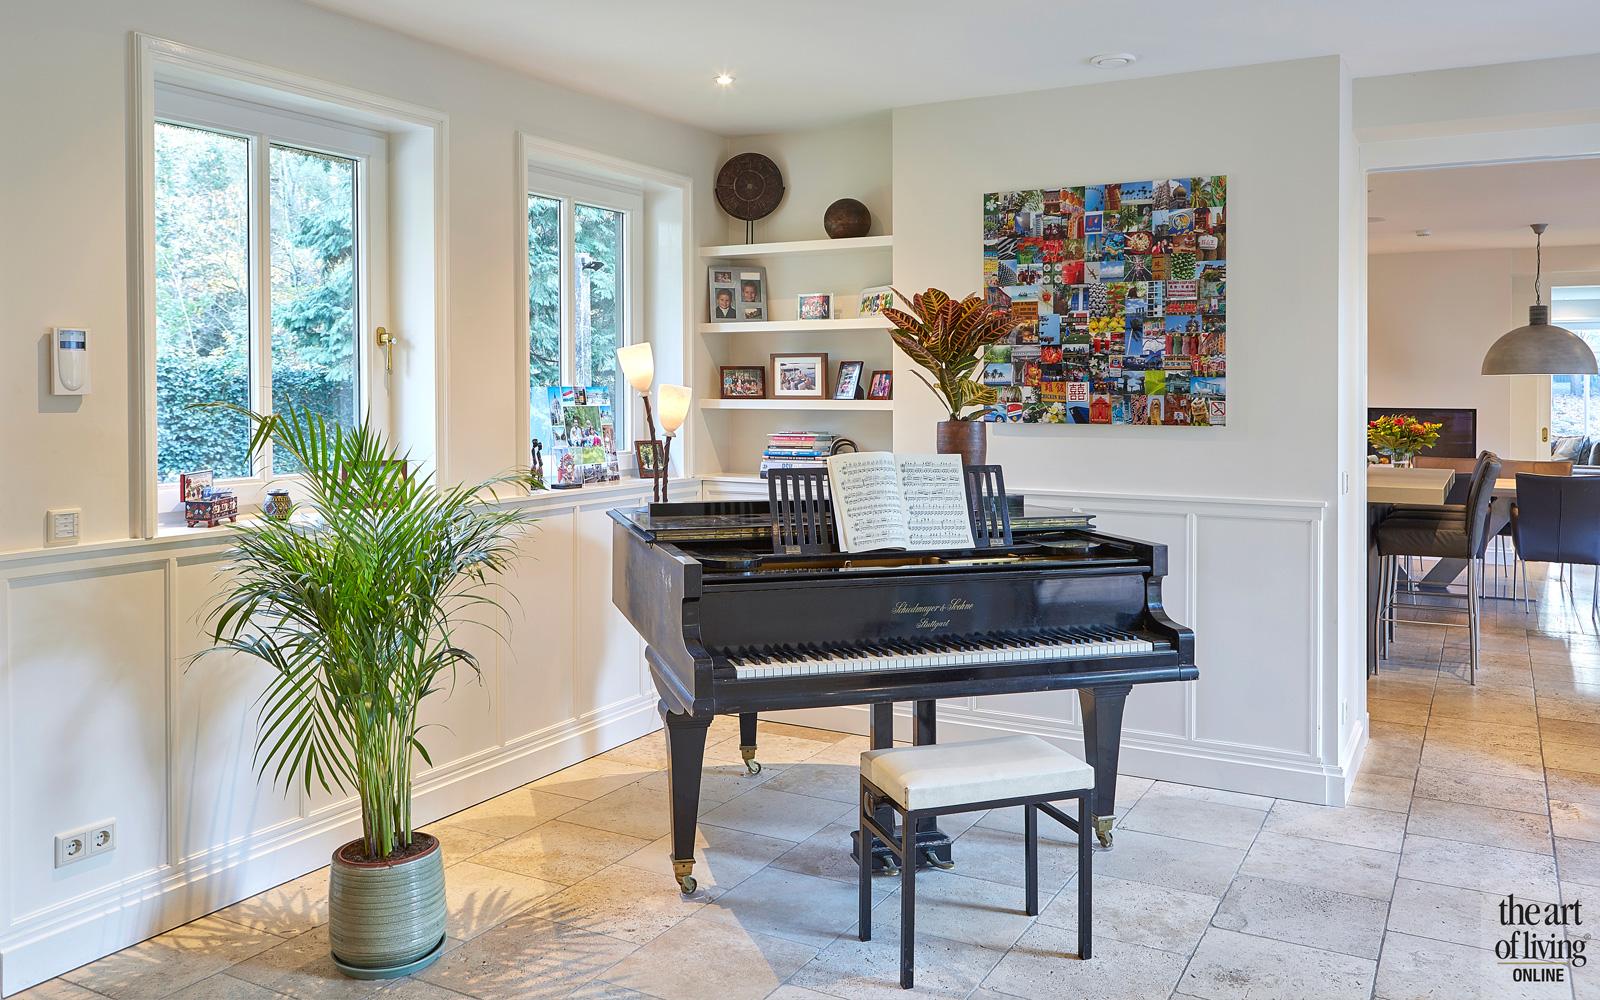 Interieurbouw Coenen Concept, Piano, Interieurontwerp, Interieur design, Margry Arts Architecten